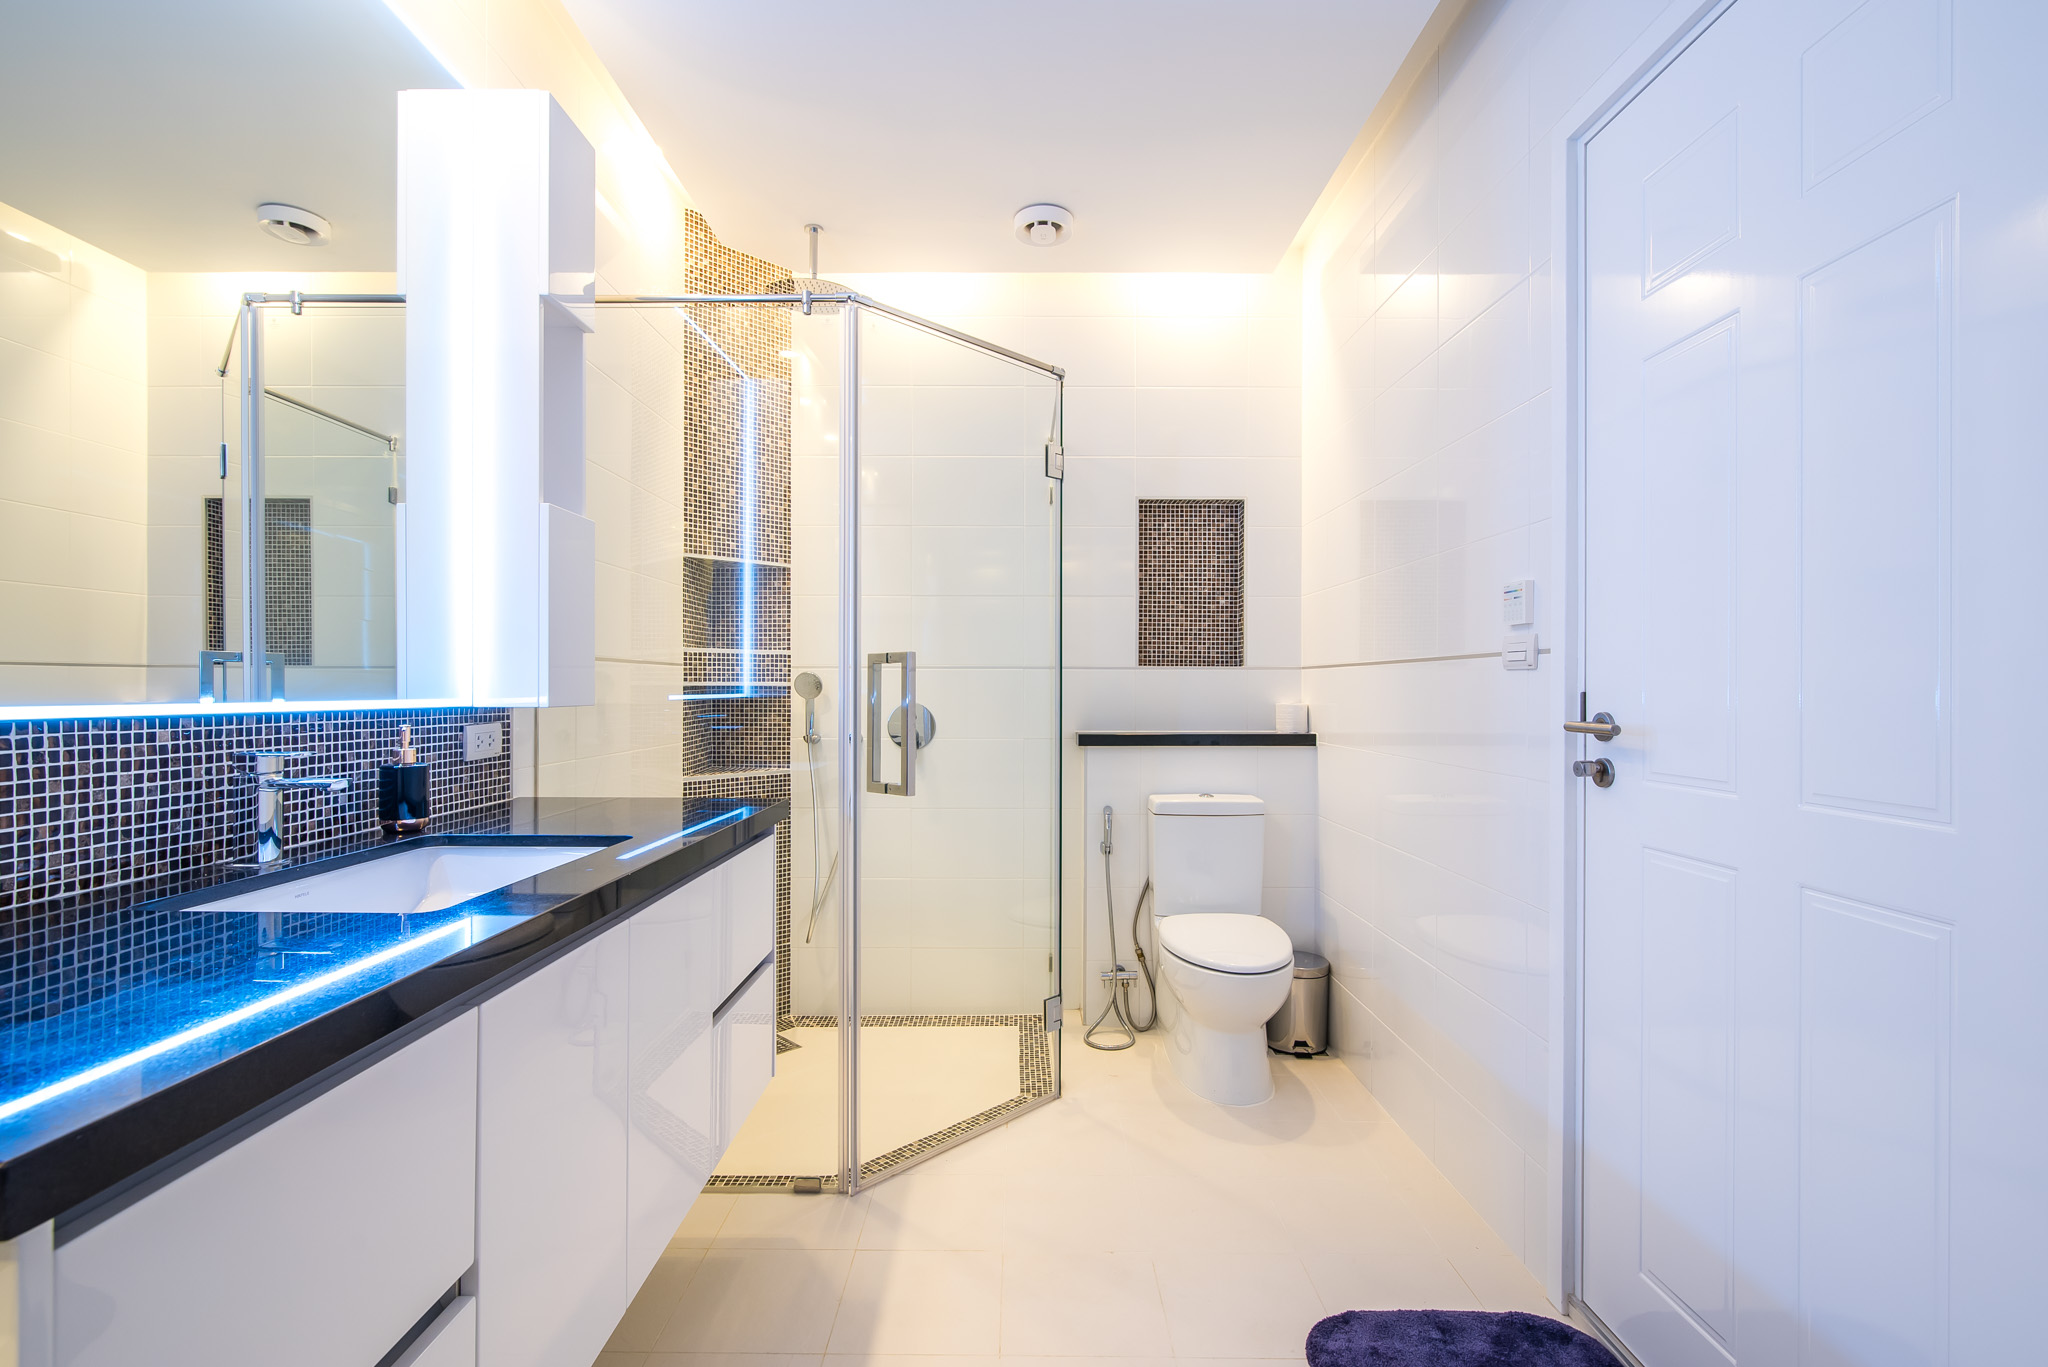 FHT Upper Master bathroom 1